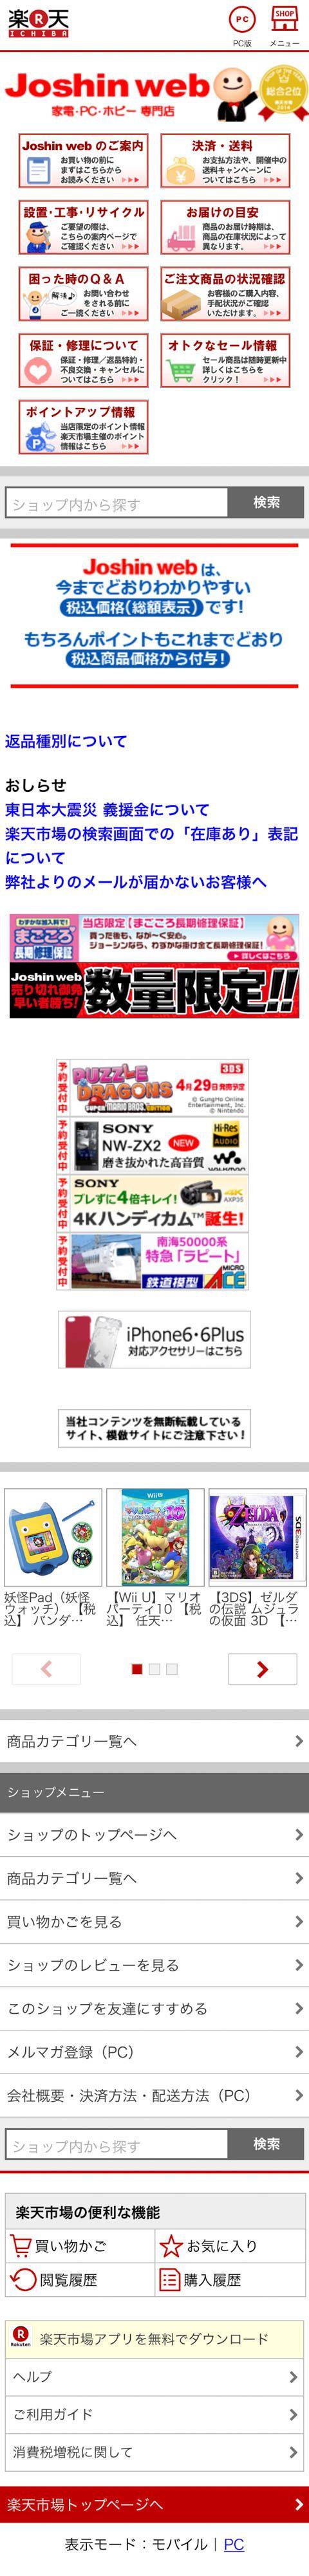 Joshin web 家電とPCの大型専門店 TOP